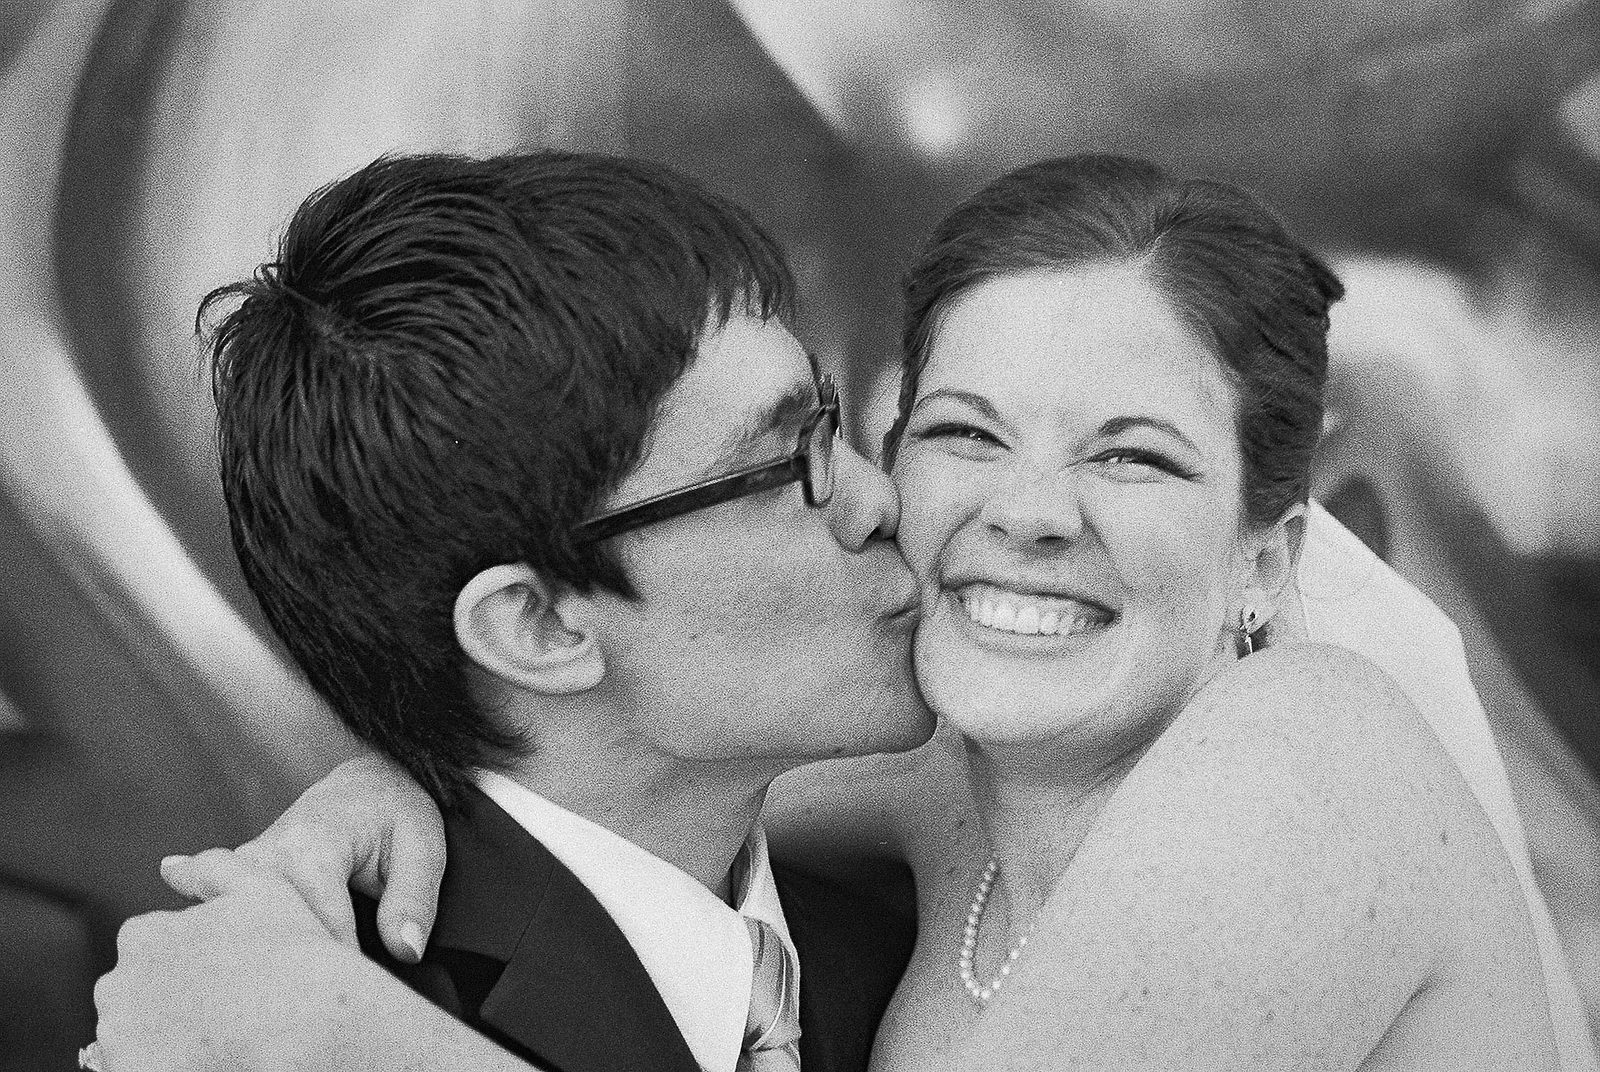 groom kissing bride black and white graffiti